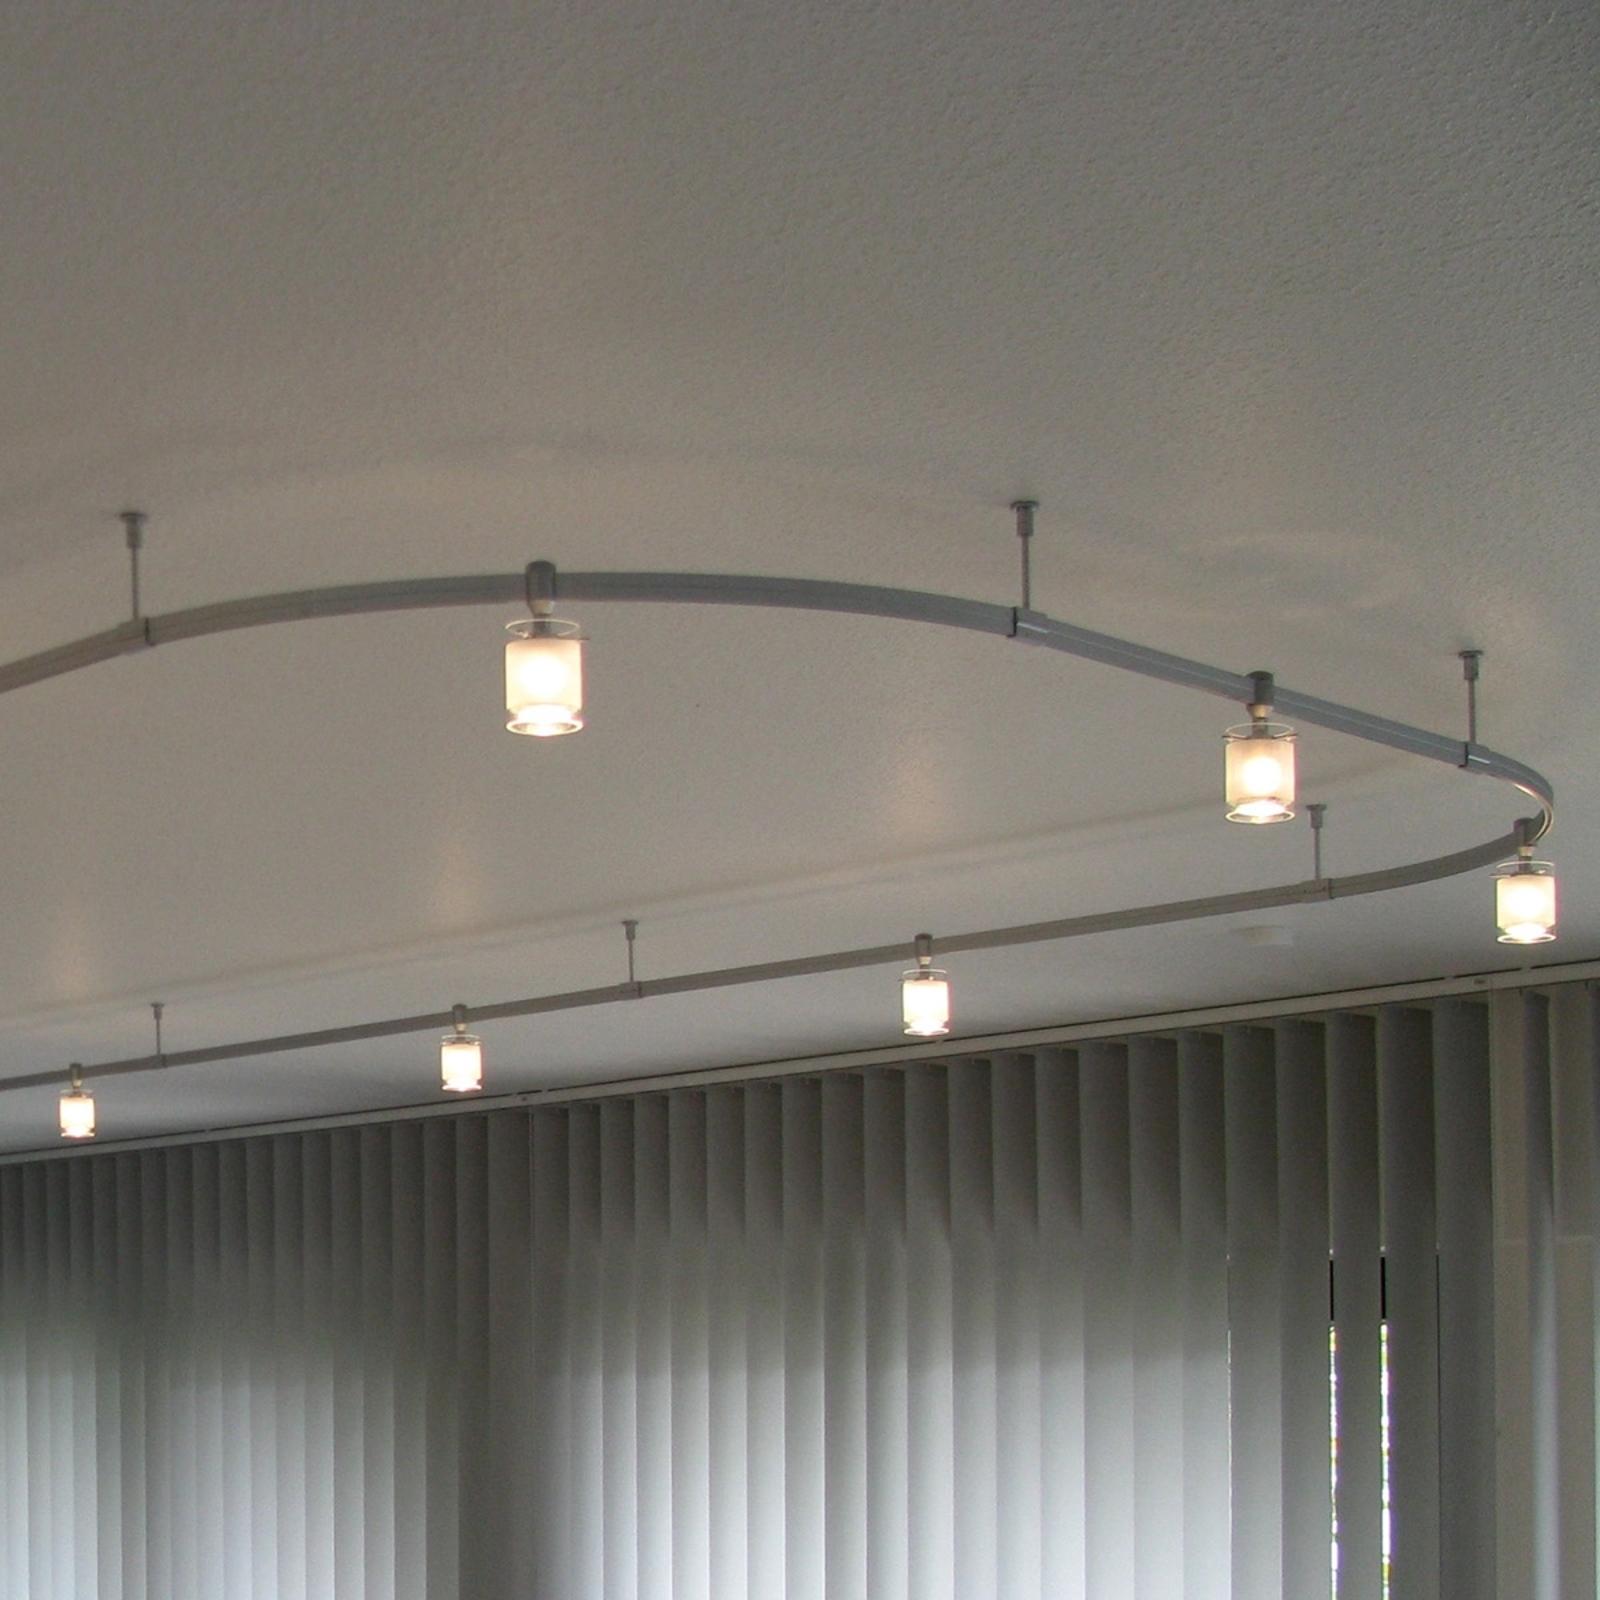 Oligo Lampen Schienensystem